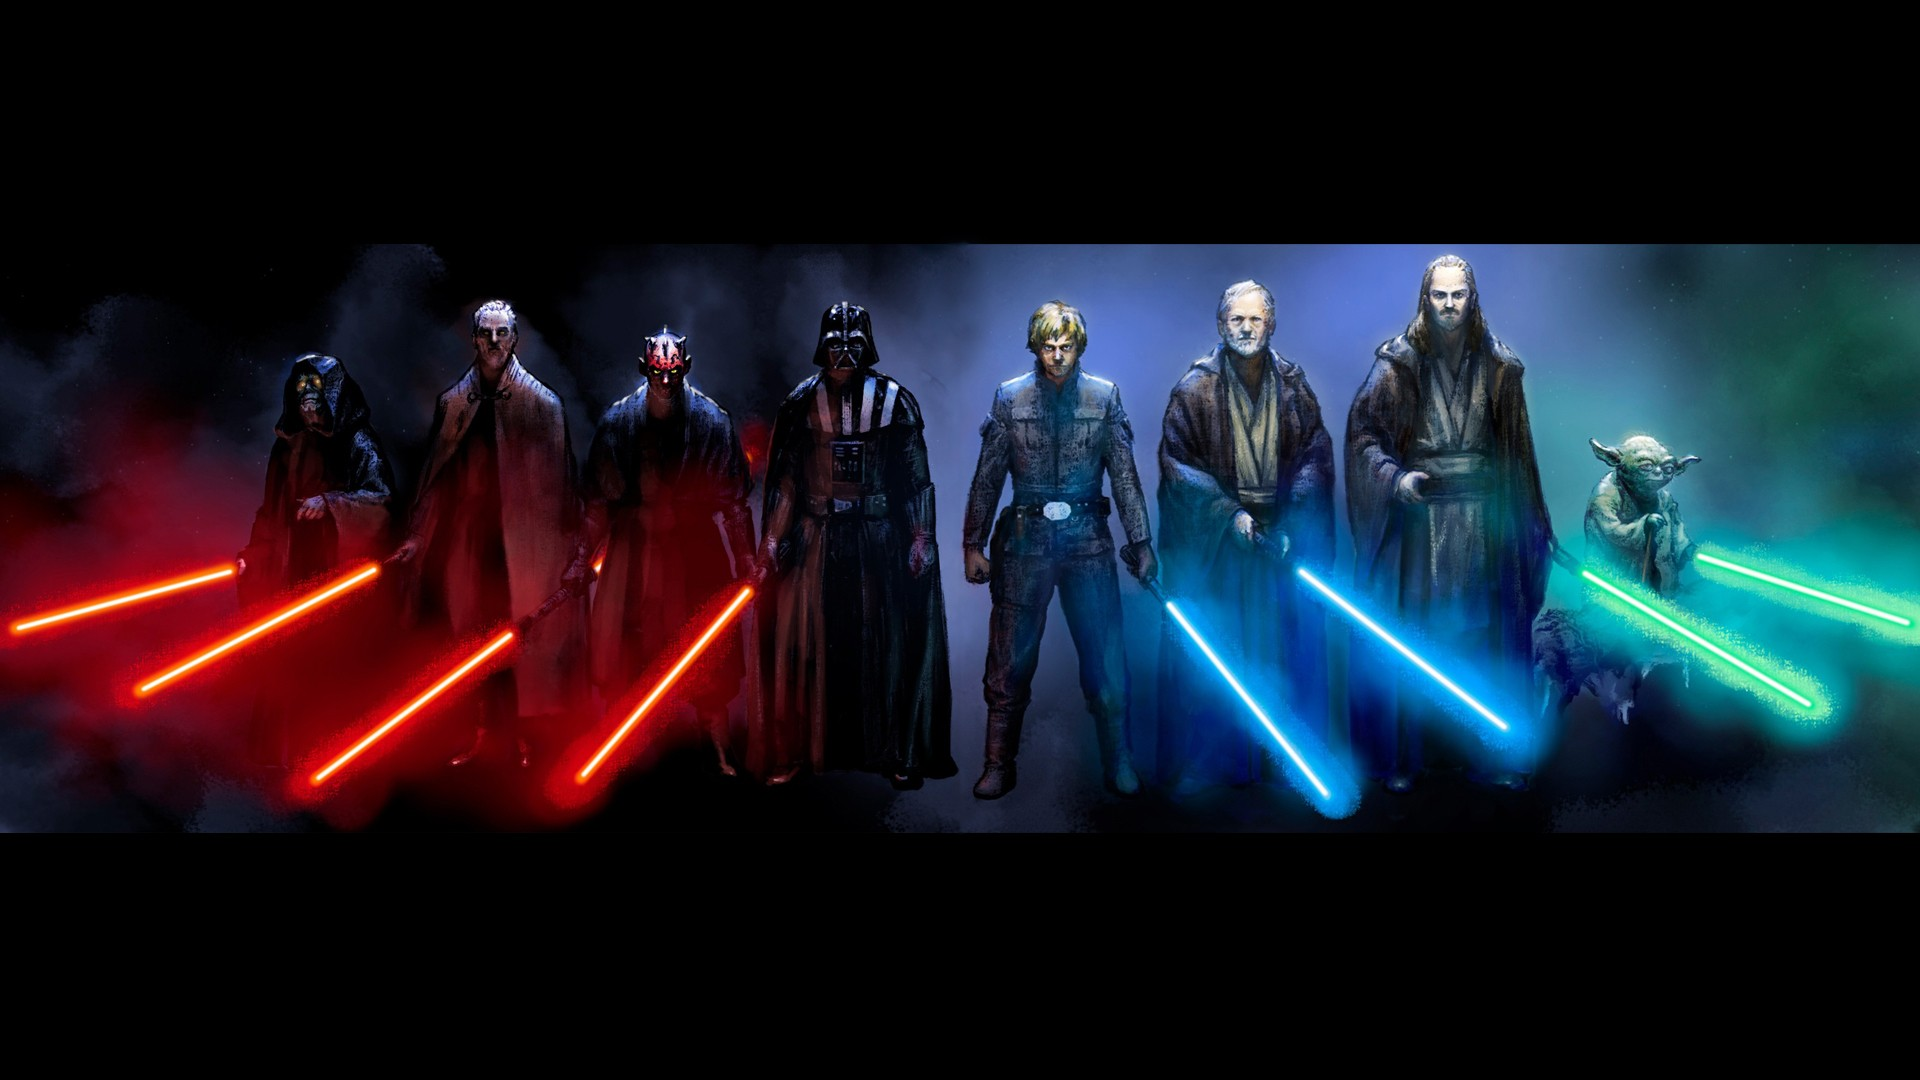 Star Wars Desktop Wallpapers Star Wars Images 1920x1080